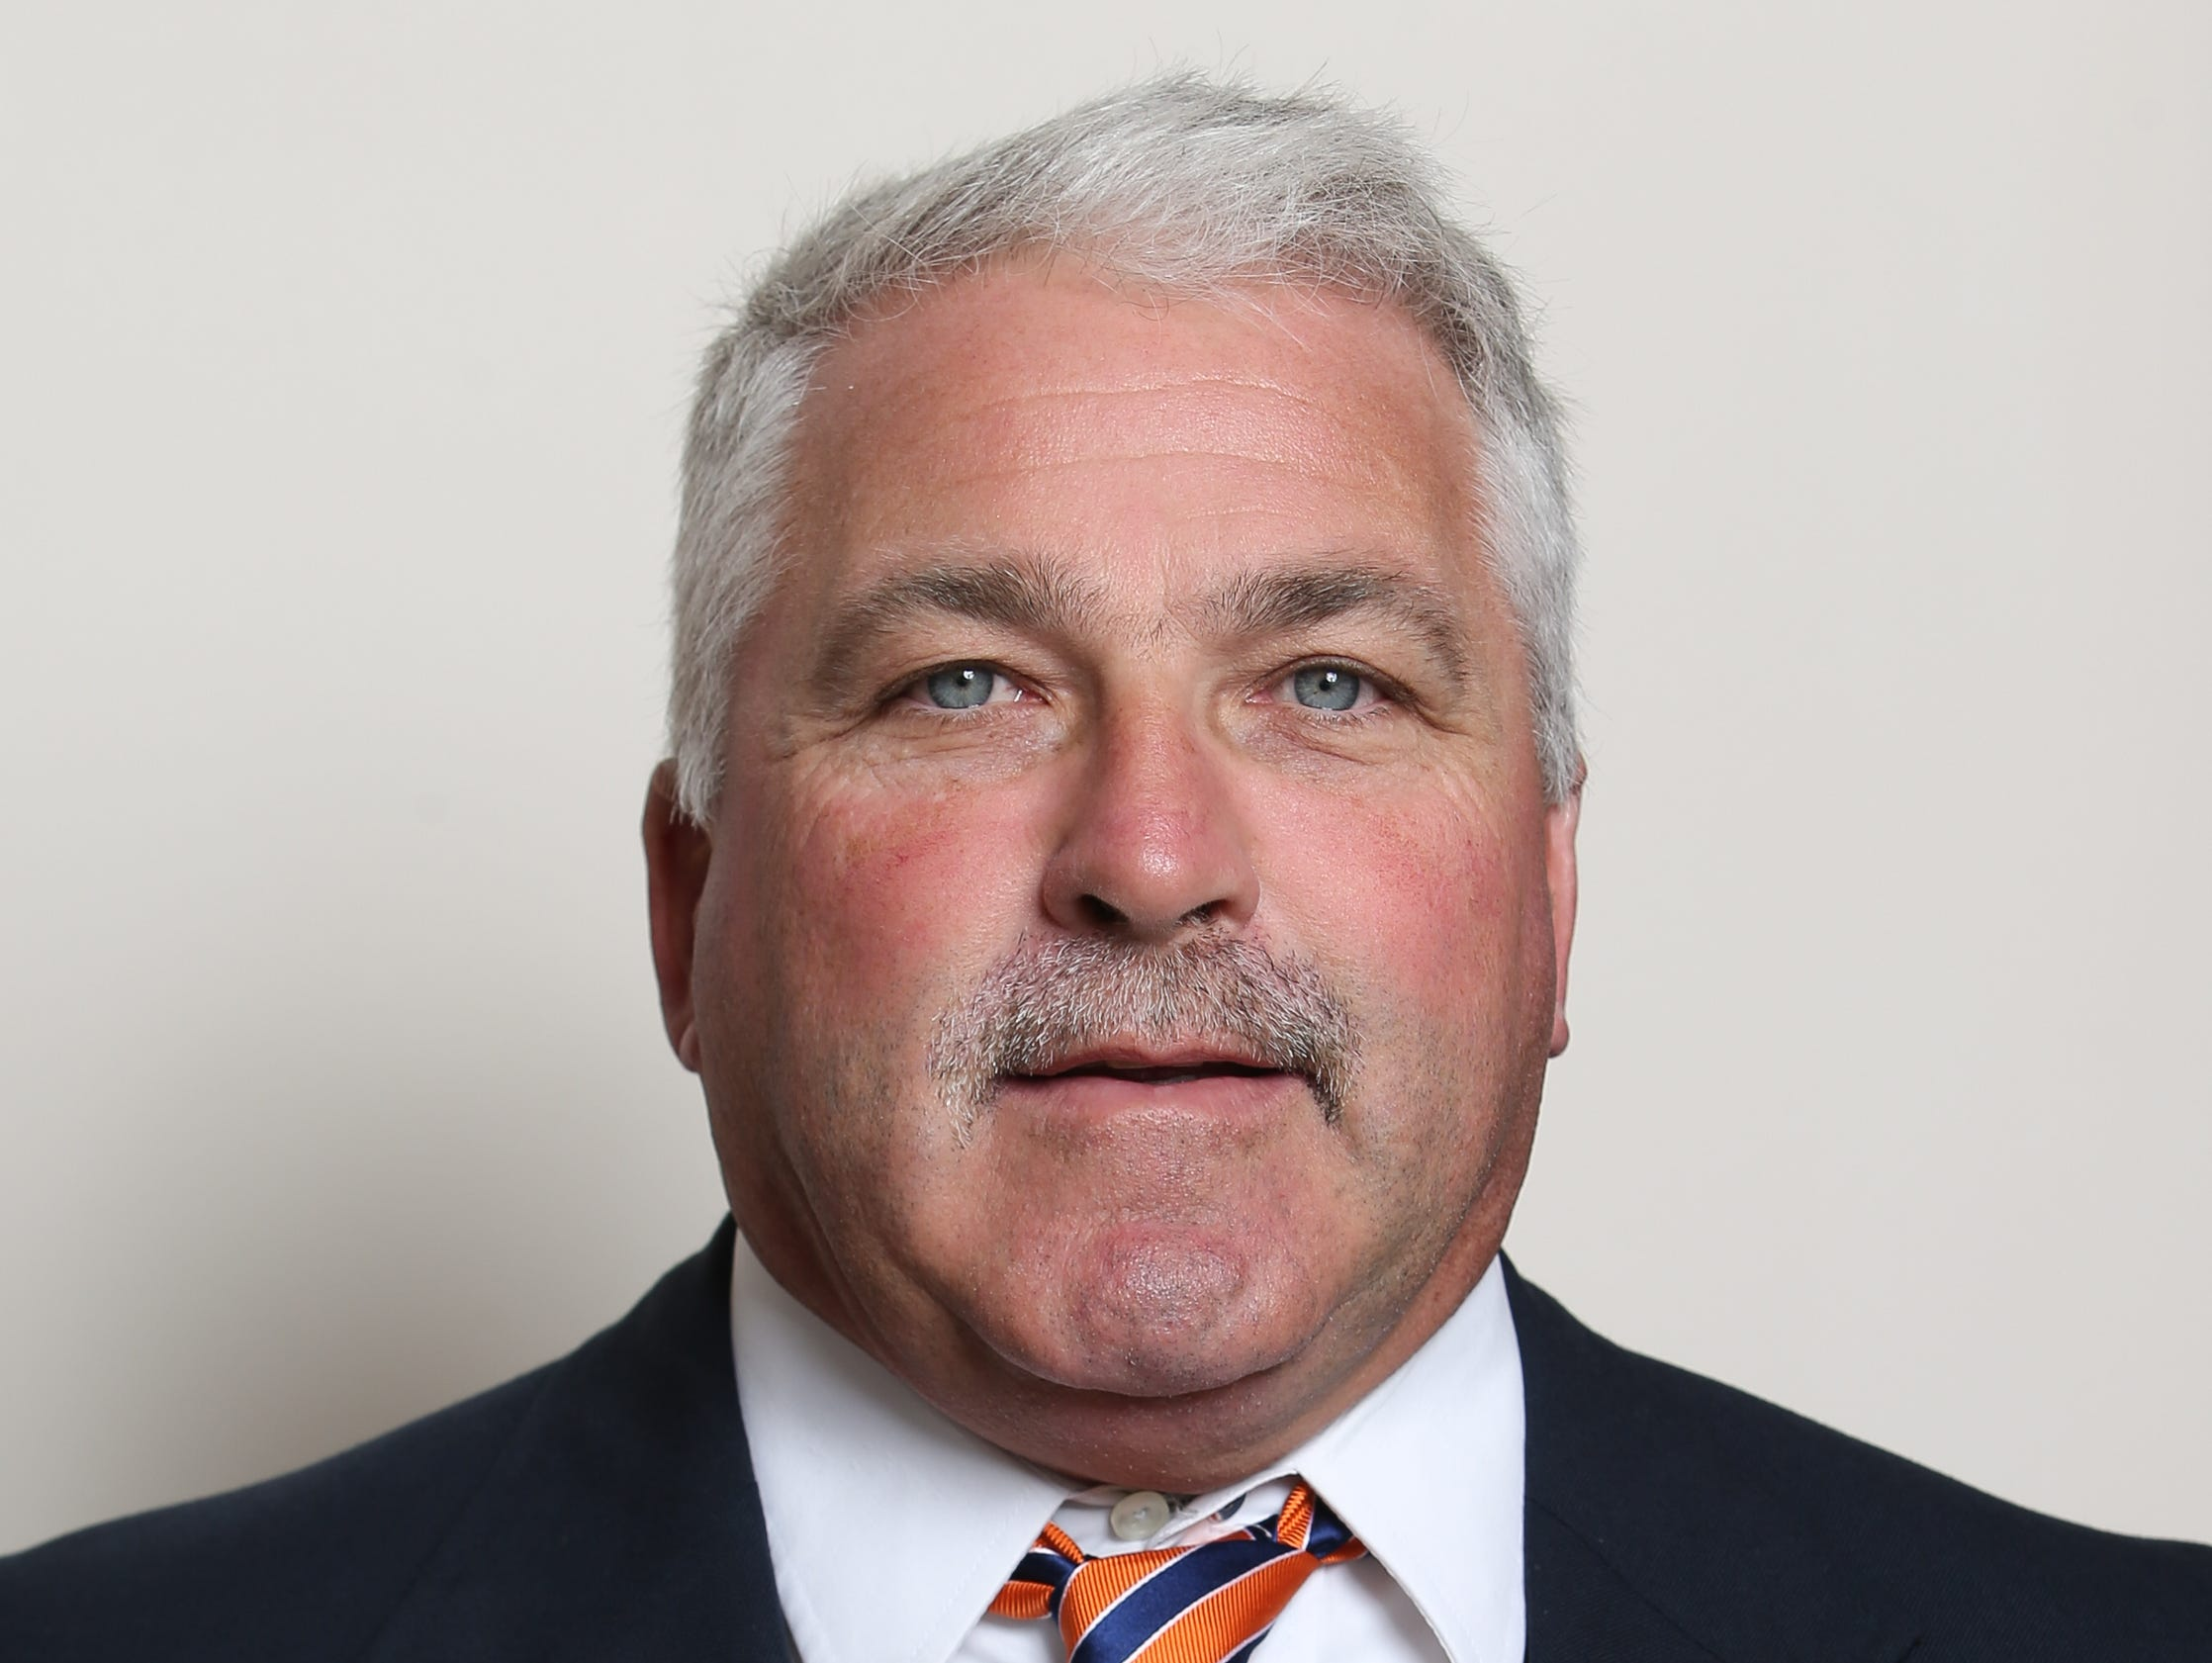 Wayne County coach Todd Mangum